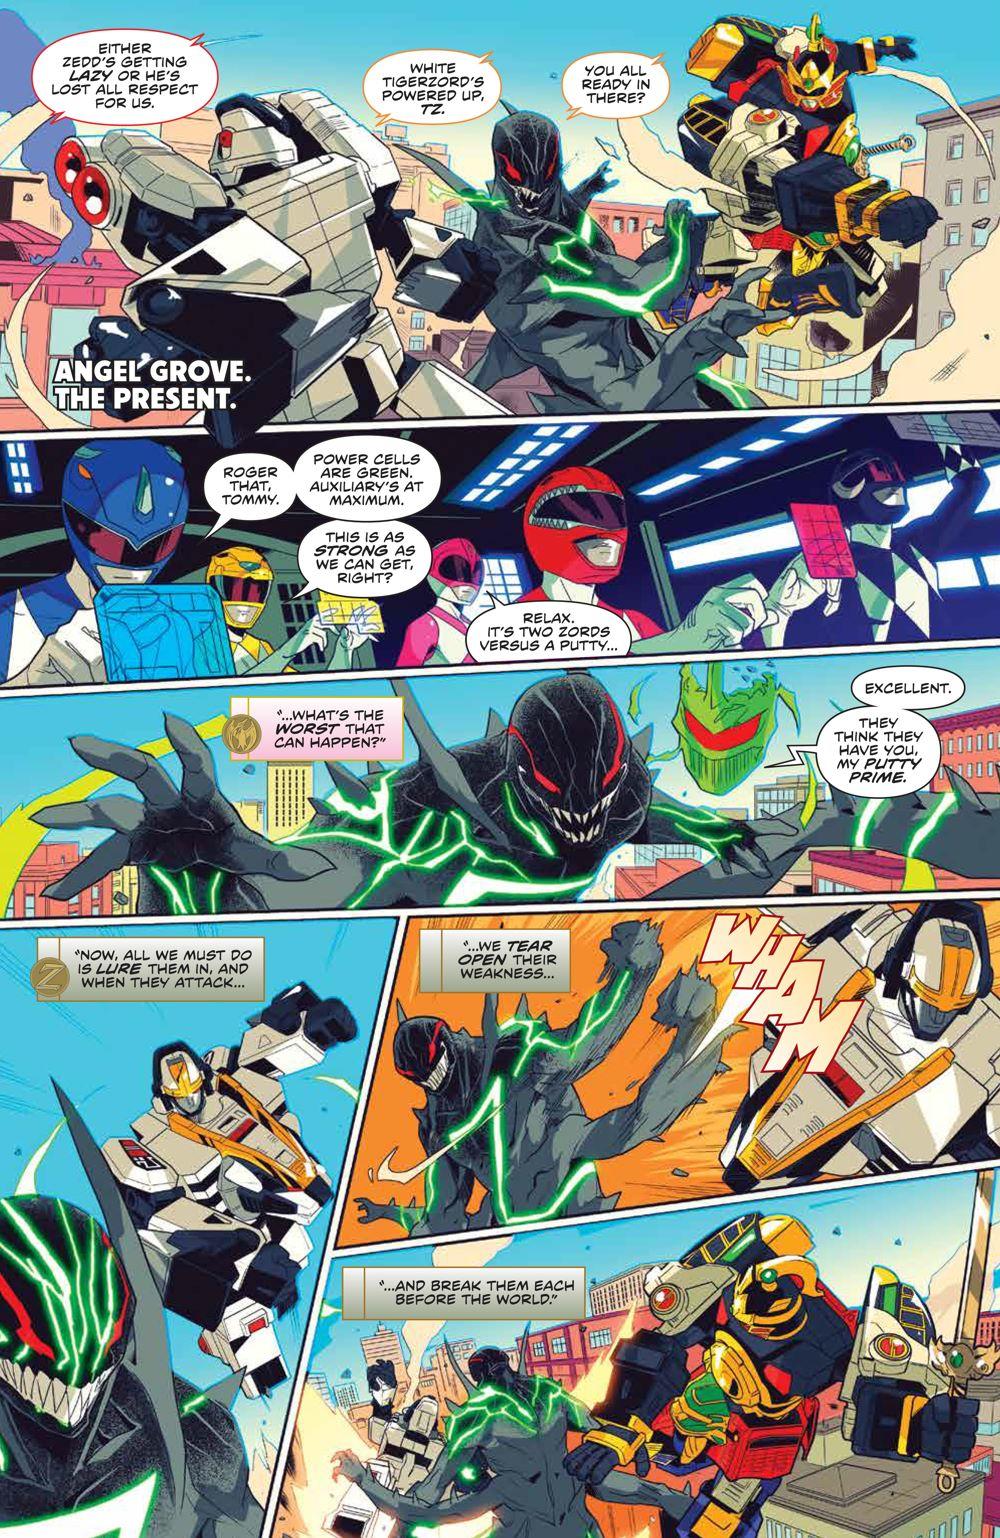 MightyMorphin_004_PRESS_6 ComicList Previews: MIGHTY MORPHIN #4